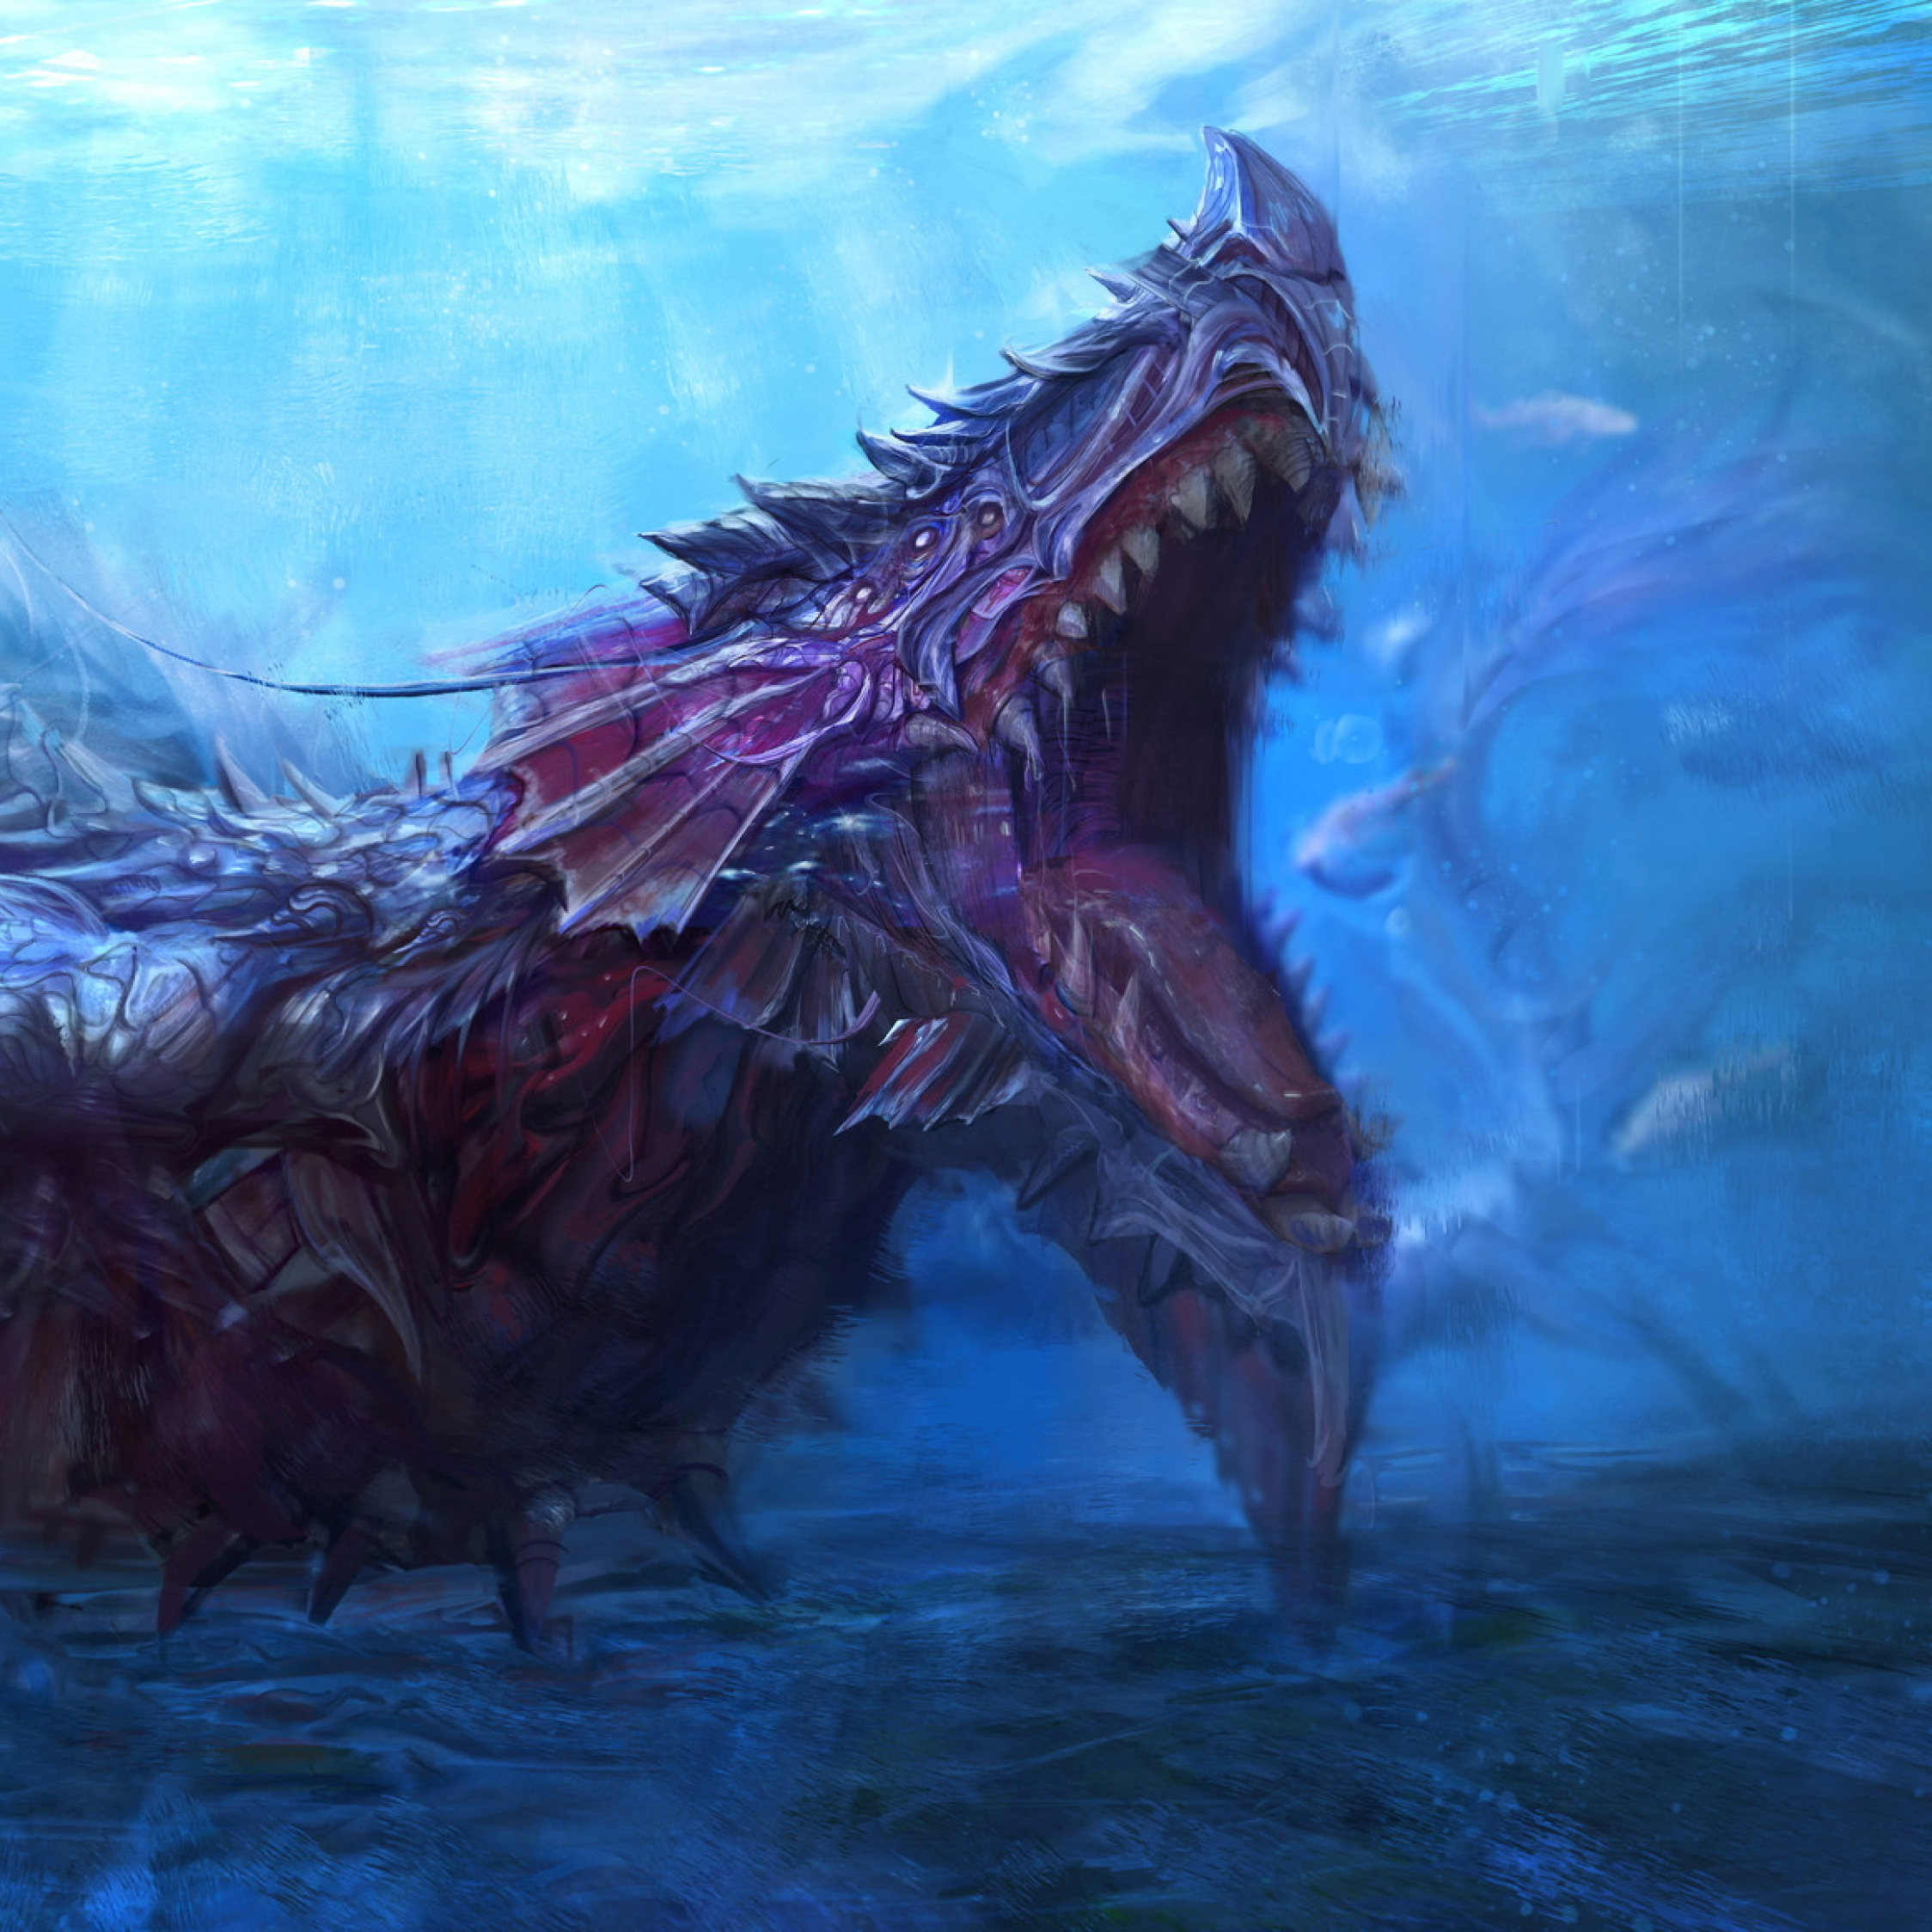 Sea Monster Underwater Creature, Full HD Wallpaper